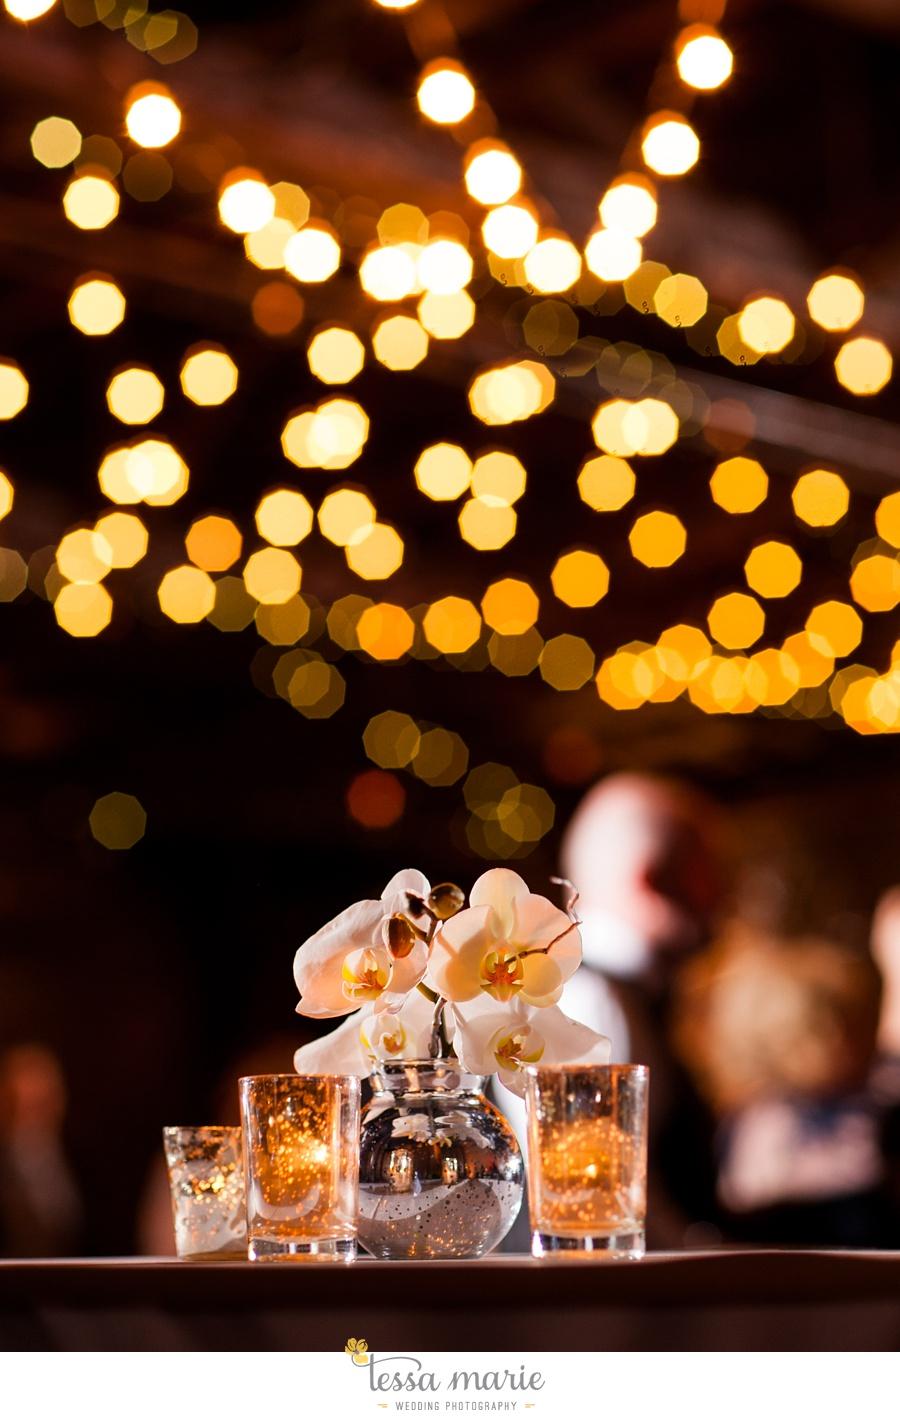 416_tessa_marie_weddings_emotional_moments_photography_king_low_wedding_sam_neil_best_atlanta_wedding_photographer